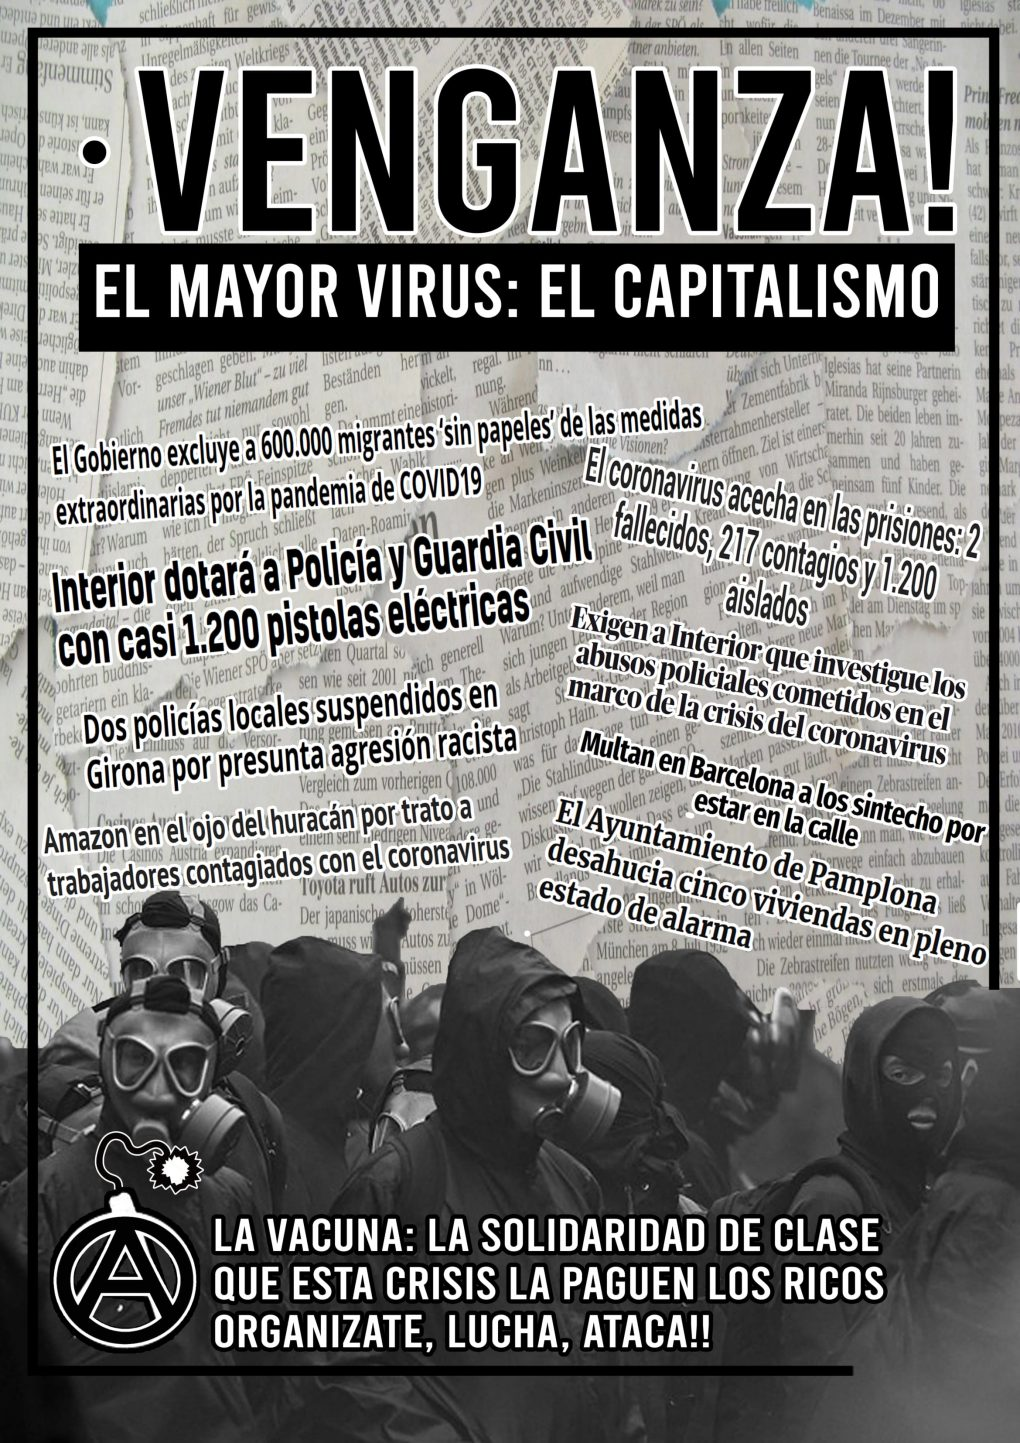 https://anarquia.info/wp-content/uploads/2020/04/COVID-19-VENGANZA-1-1020x1443.jpg